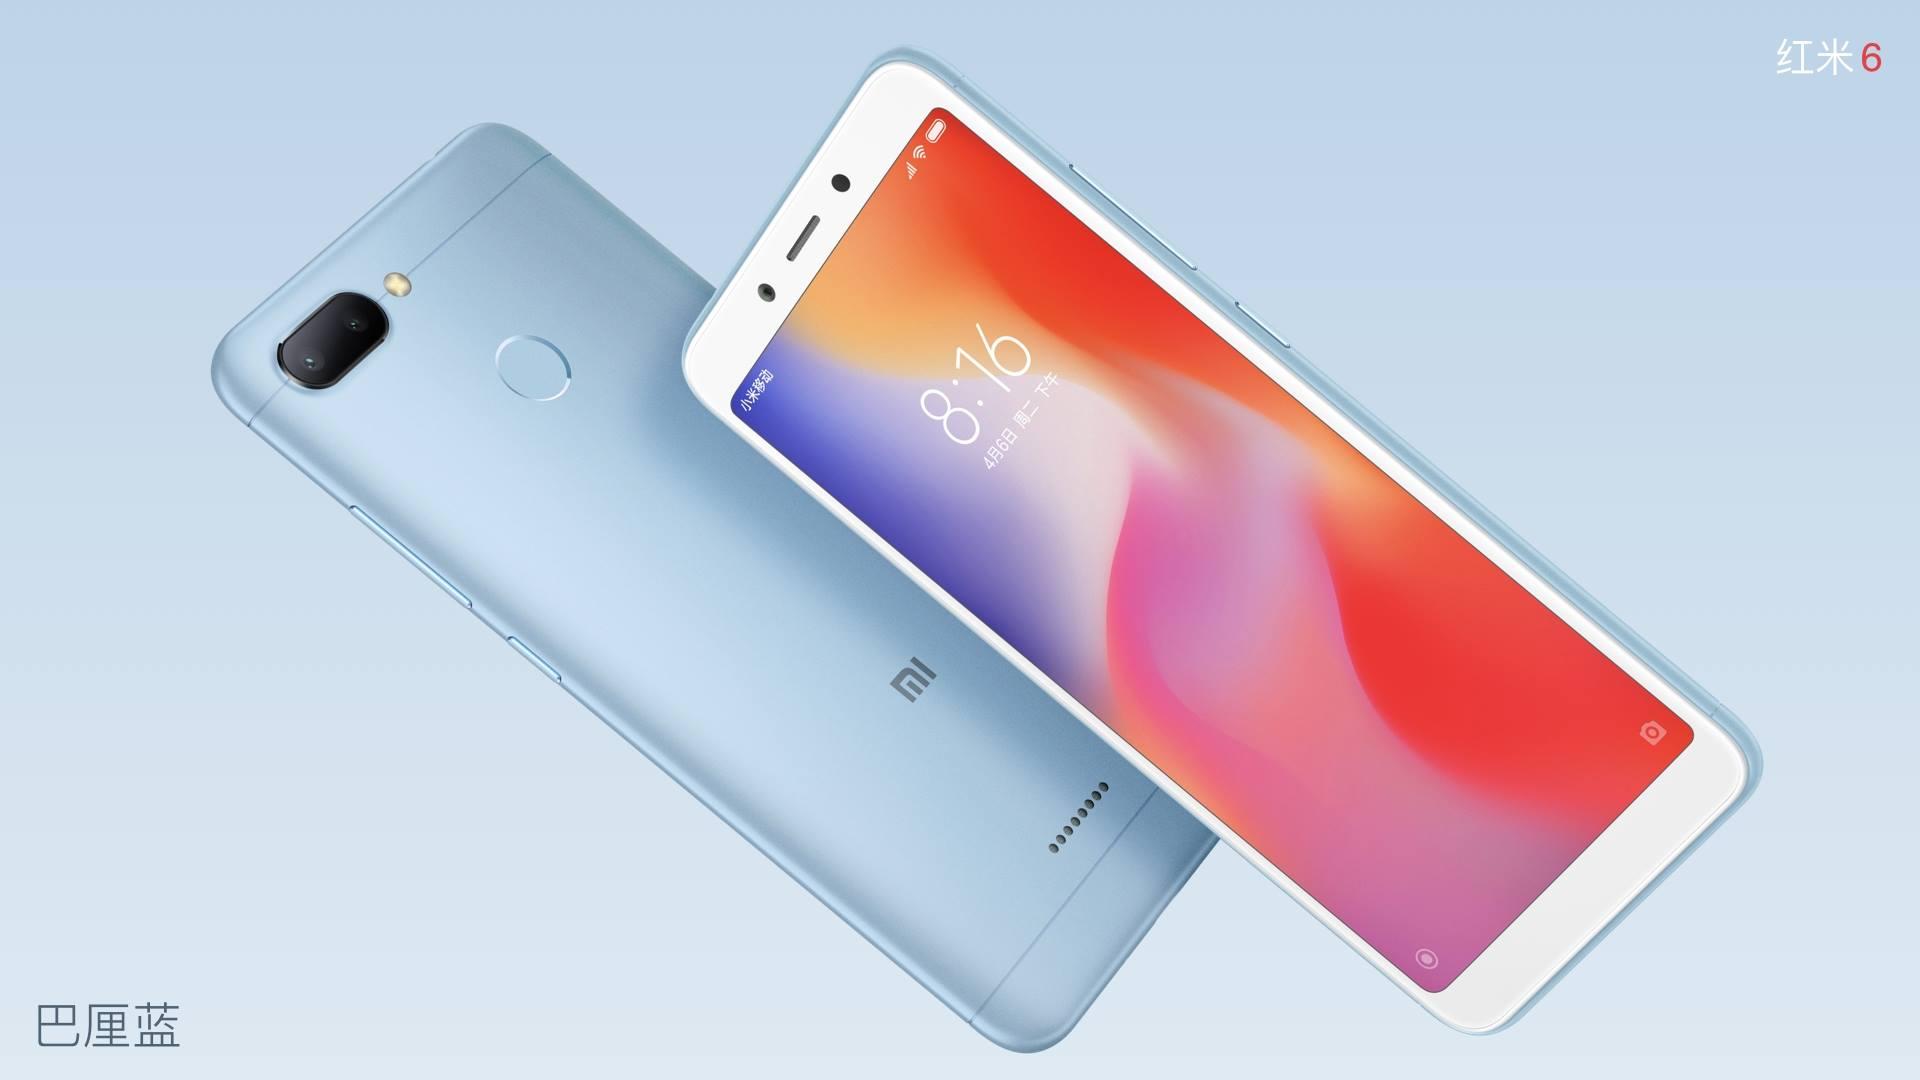 Xiaomi Redmi 6 y Redmi 6A